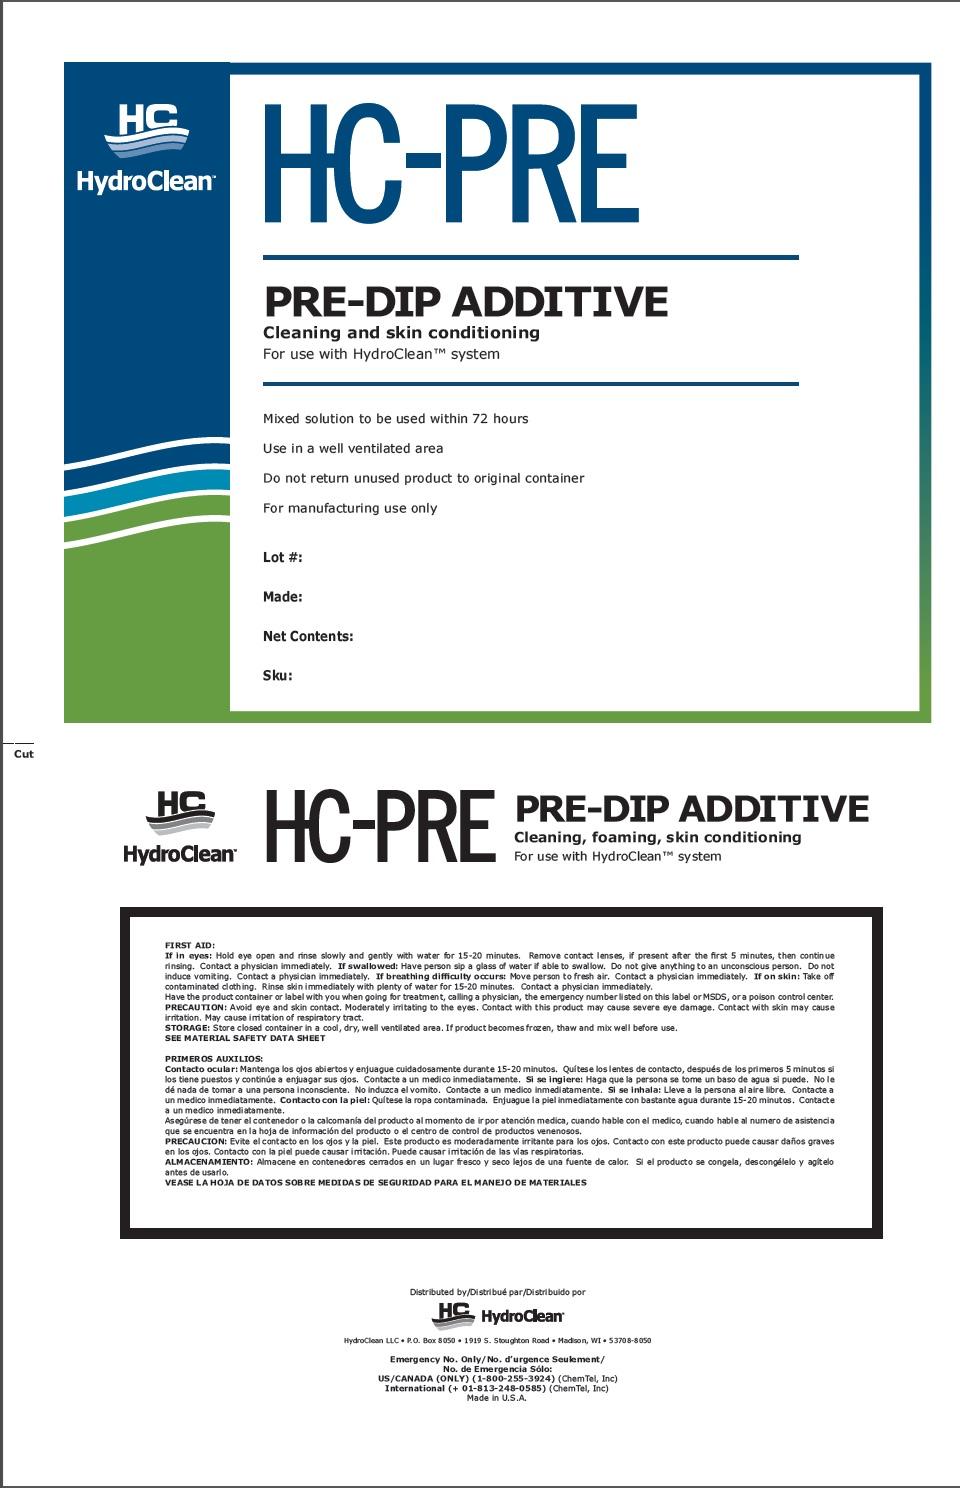 Hc-pre (Pre-dip Additive) Liquid [Hydroclean]